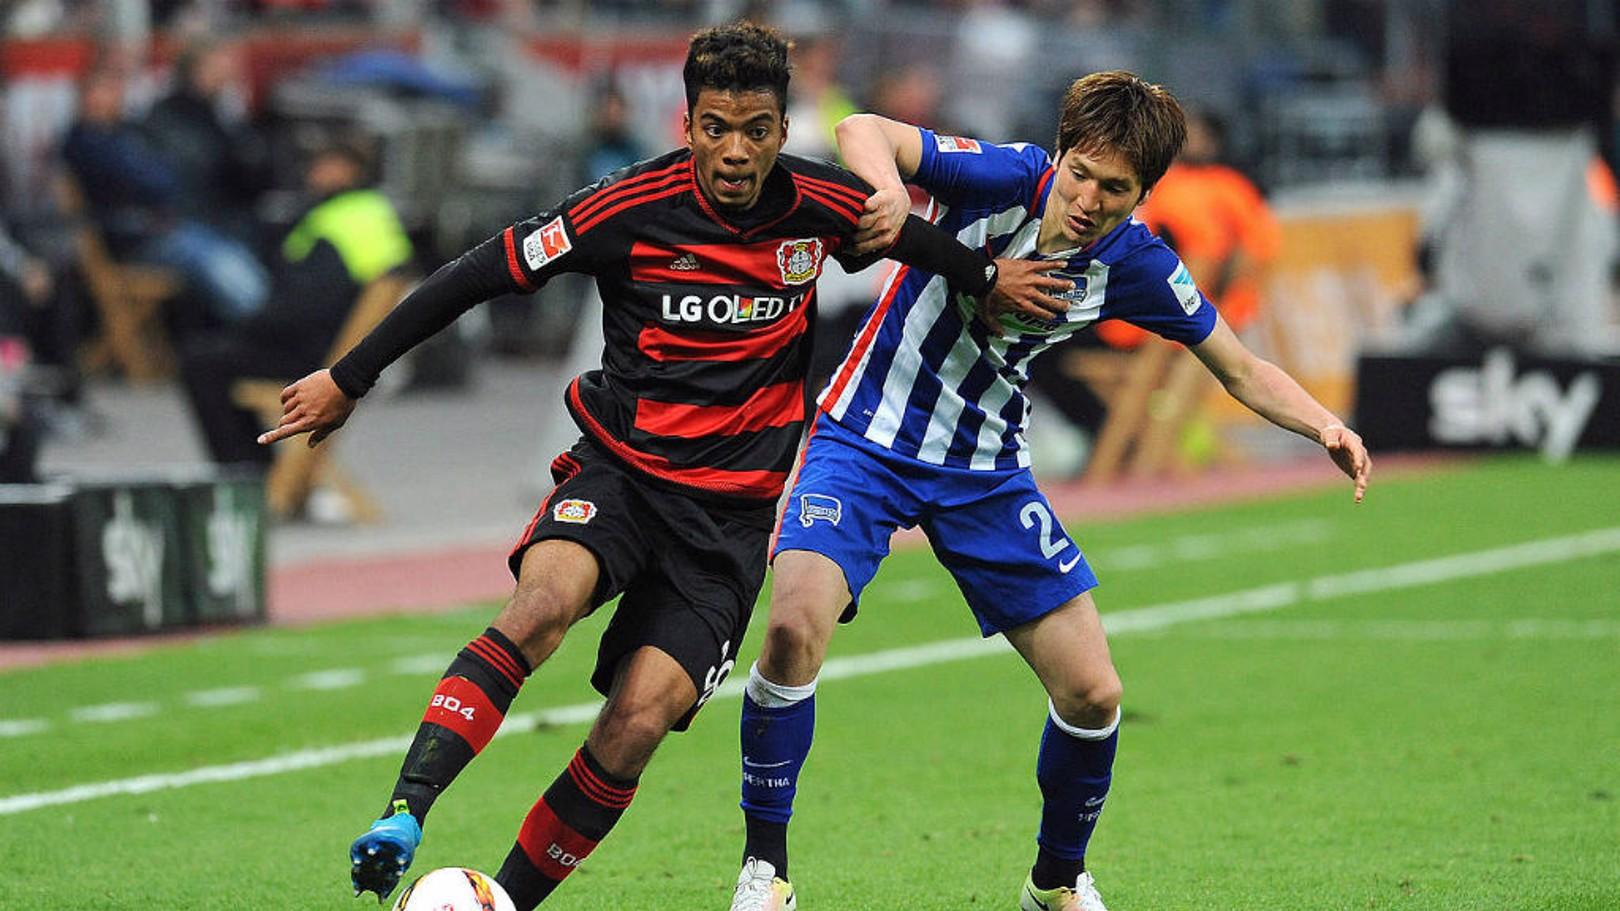 Mail: Leverkusen defender on Man City radar